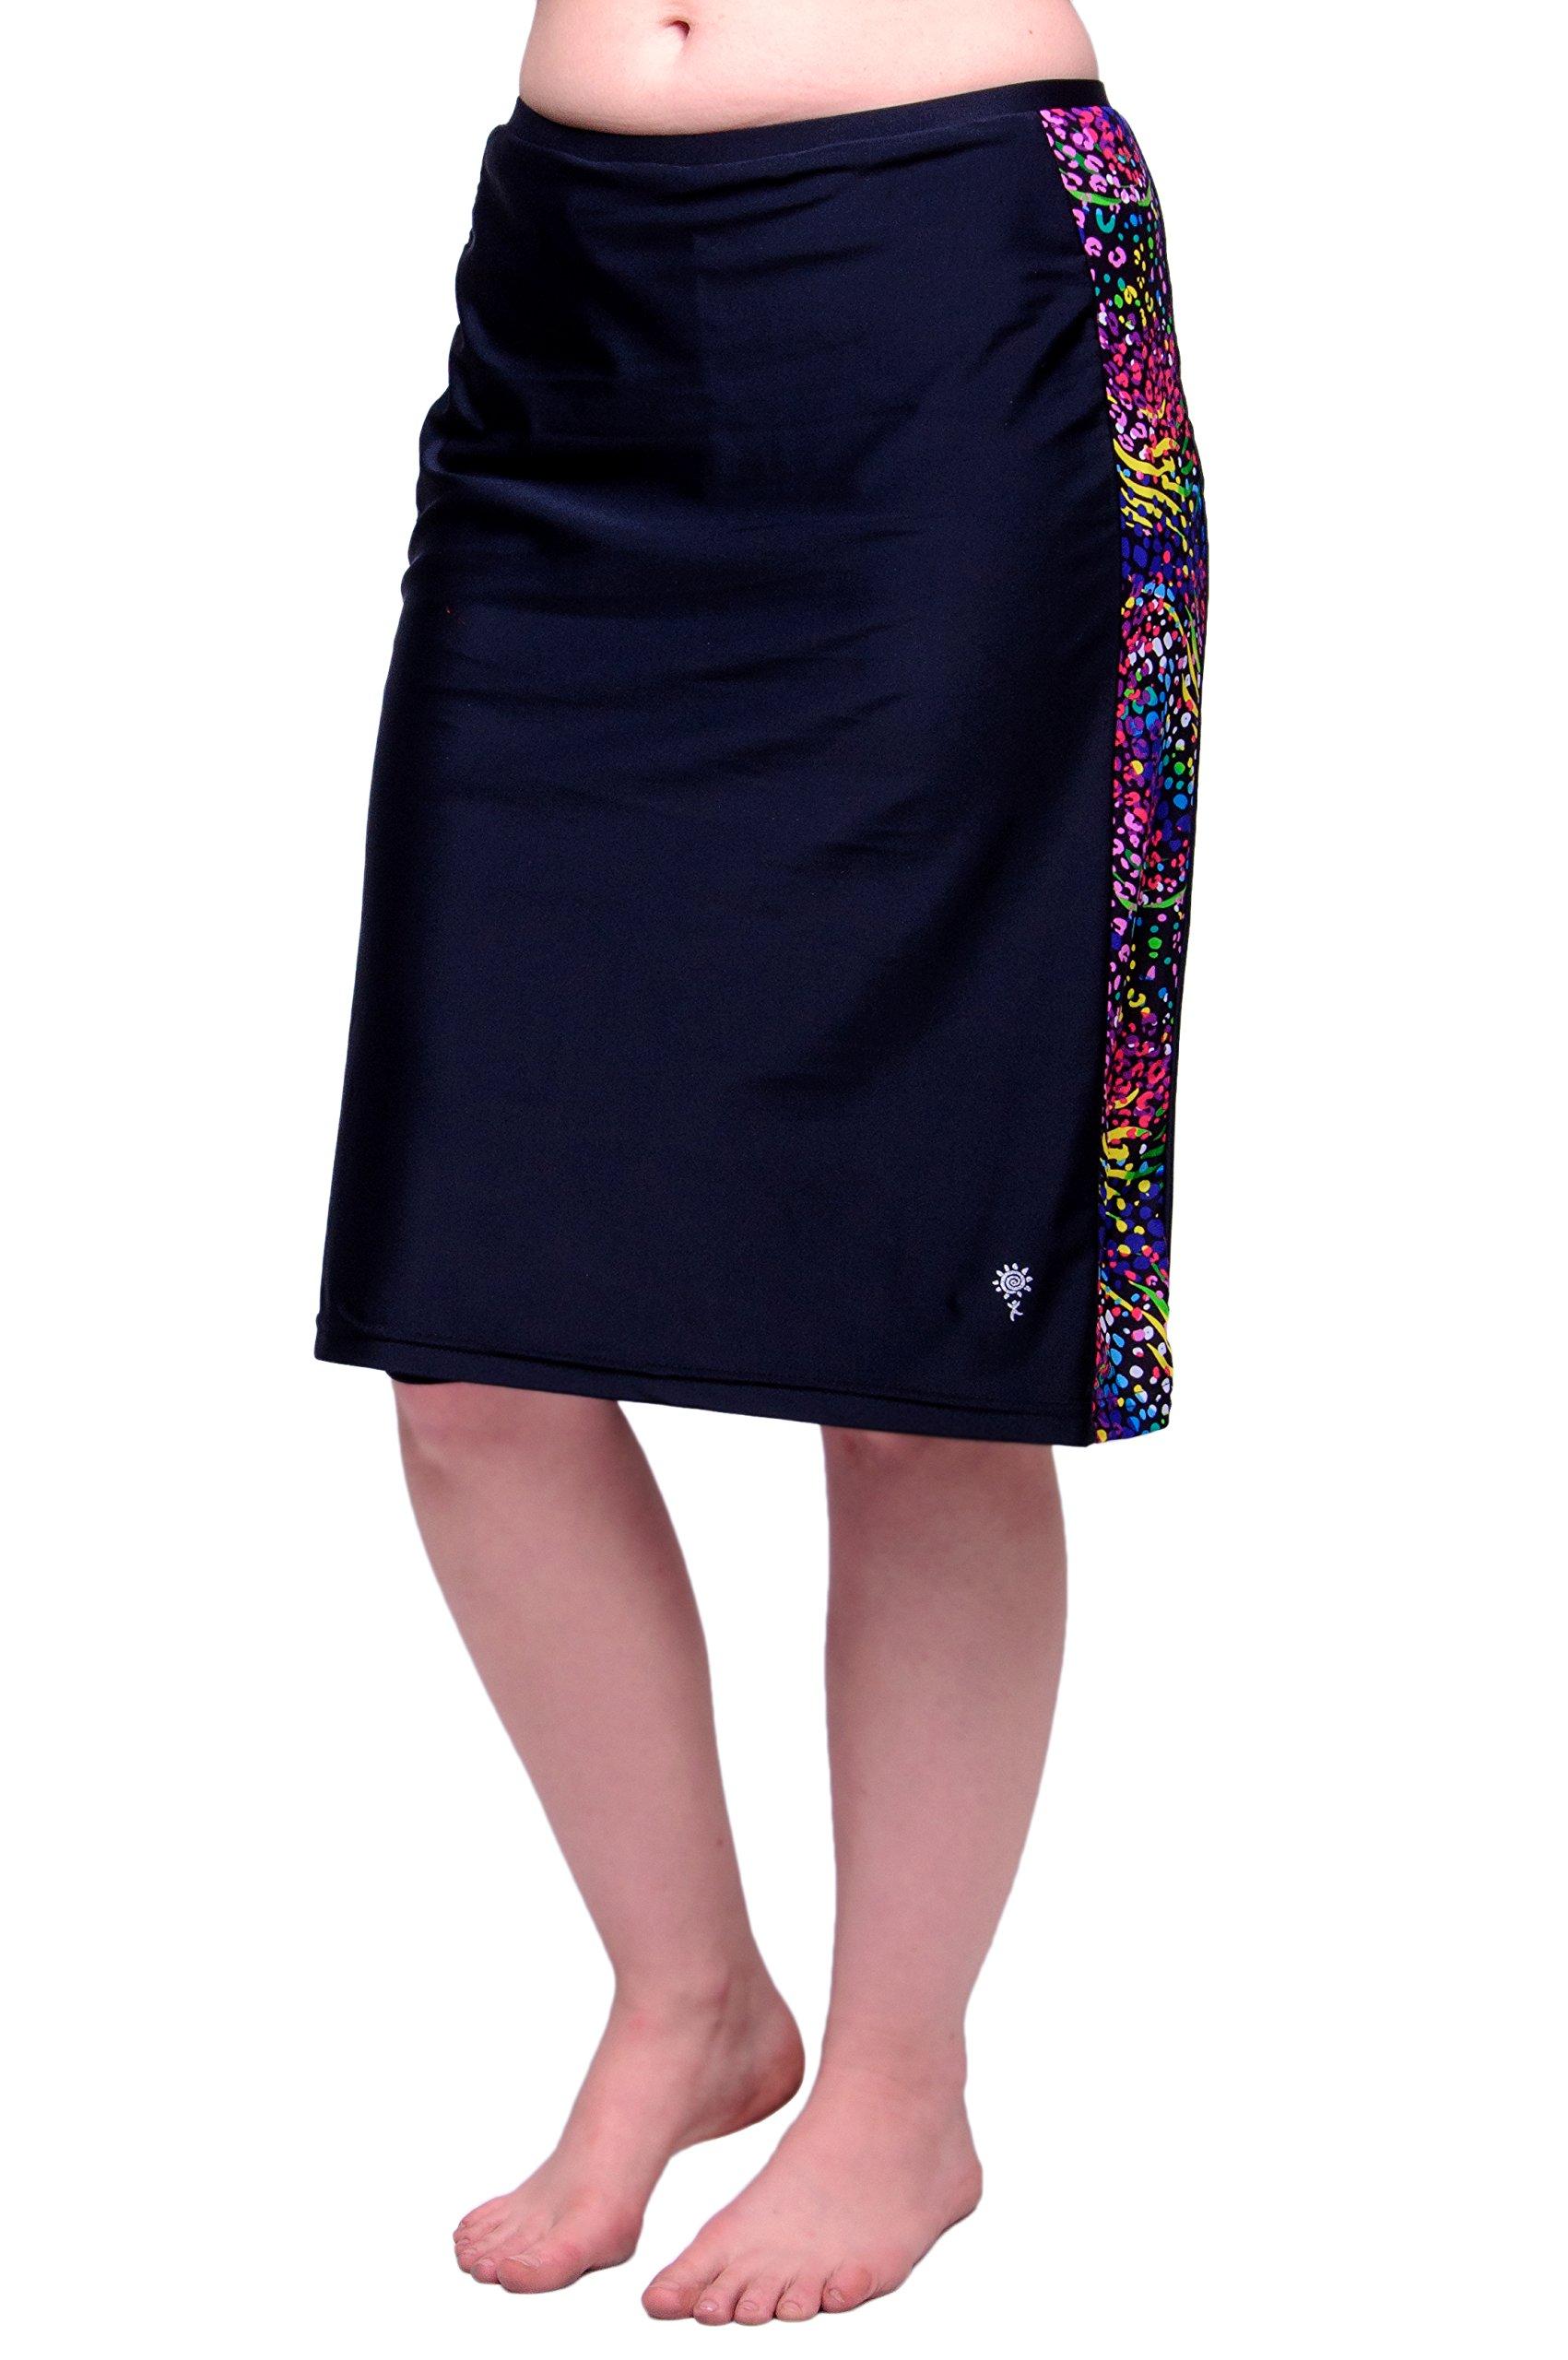 HydroChic Women's Plus Size Modest Swim Skirt With Leggings, Skirted Swim Bottoms (Black/Tiger, 2X)